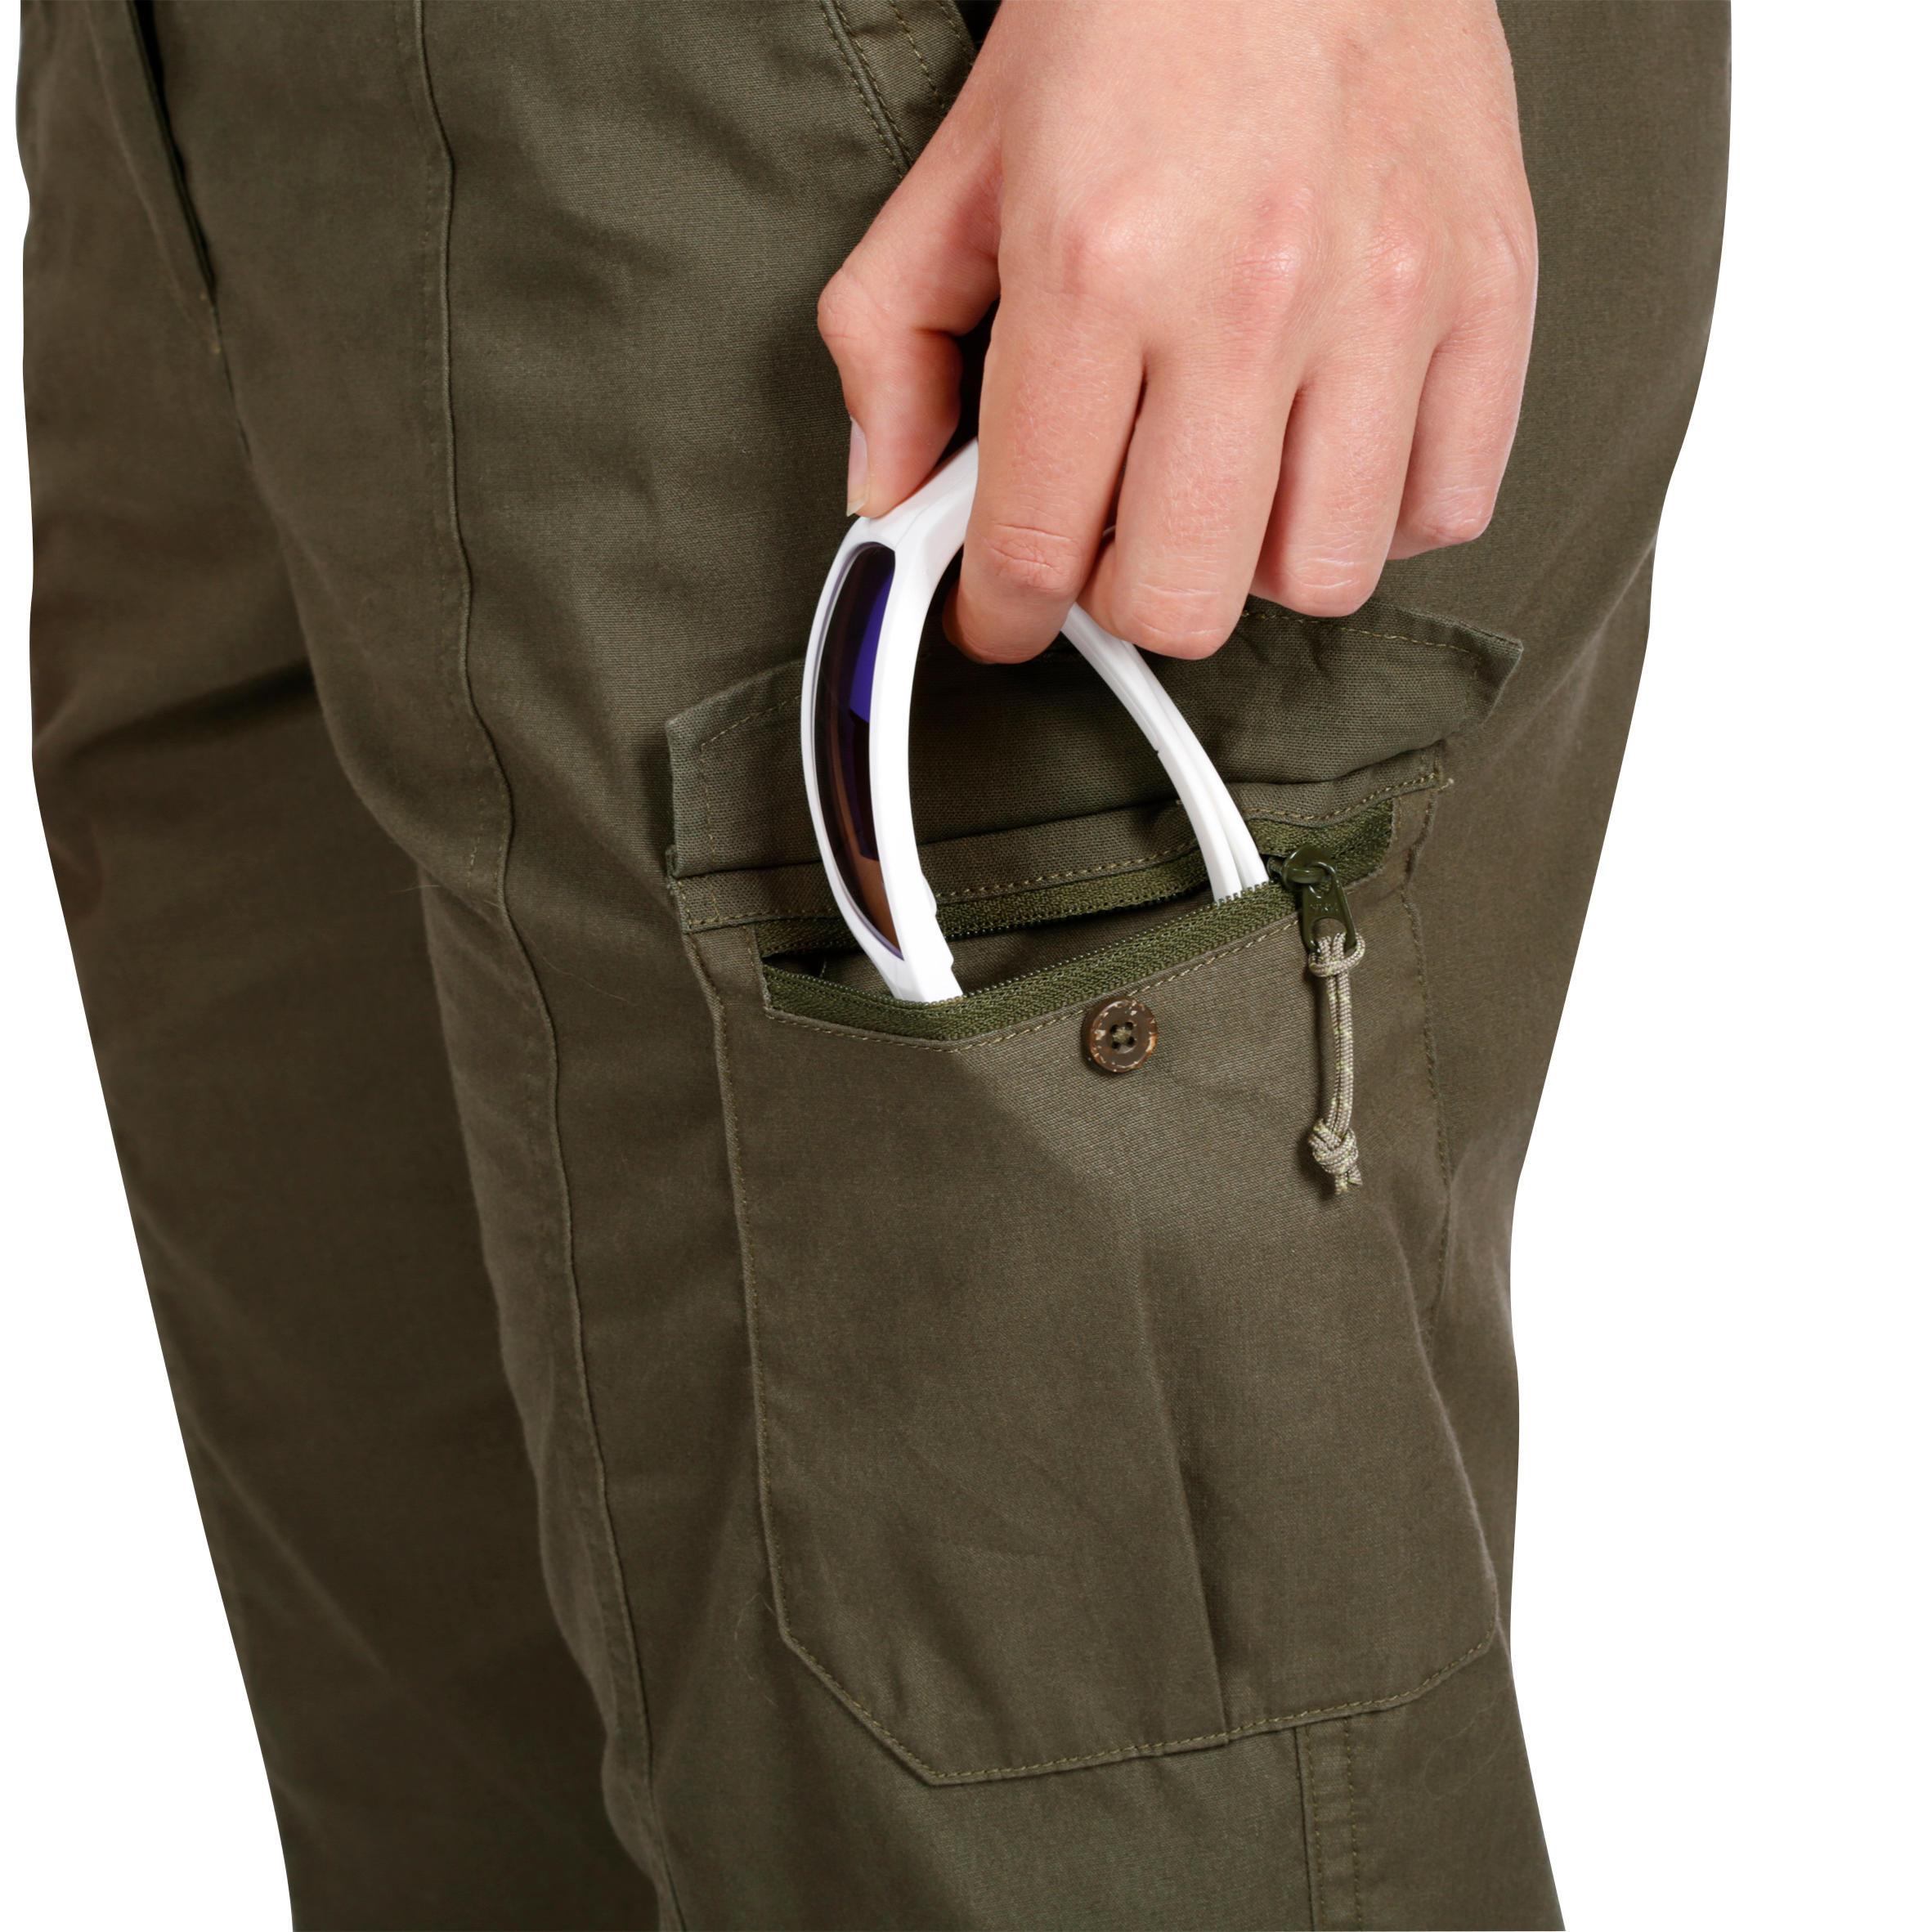 Travel 100 Women's Trousers - Khaki